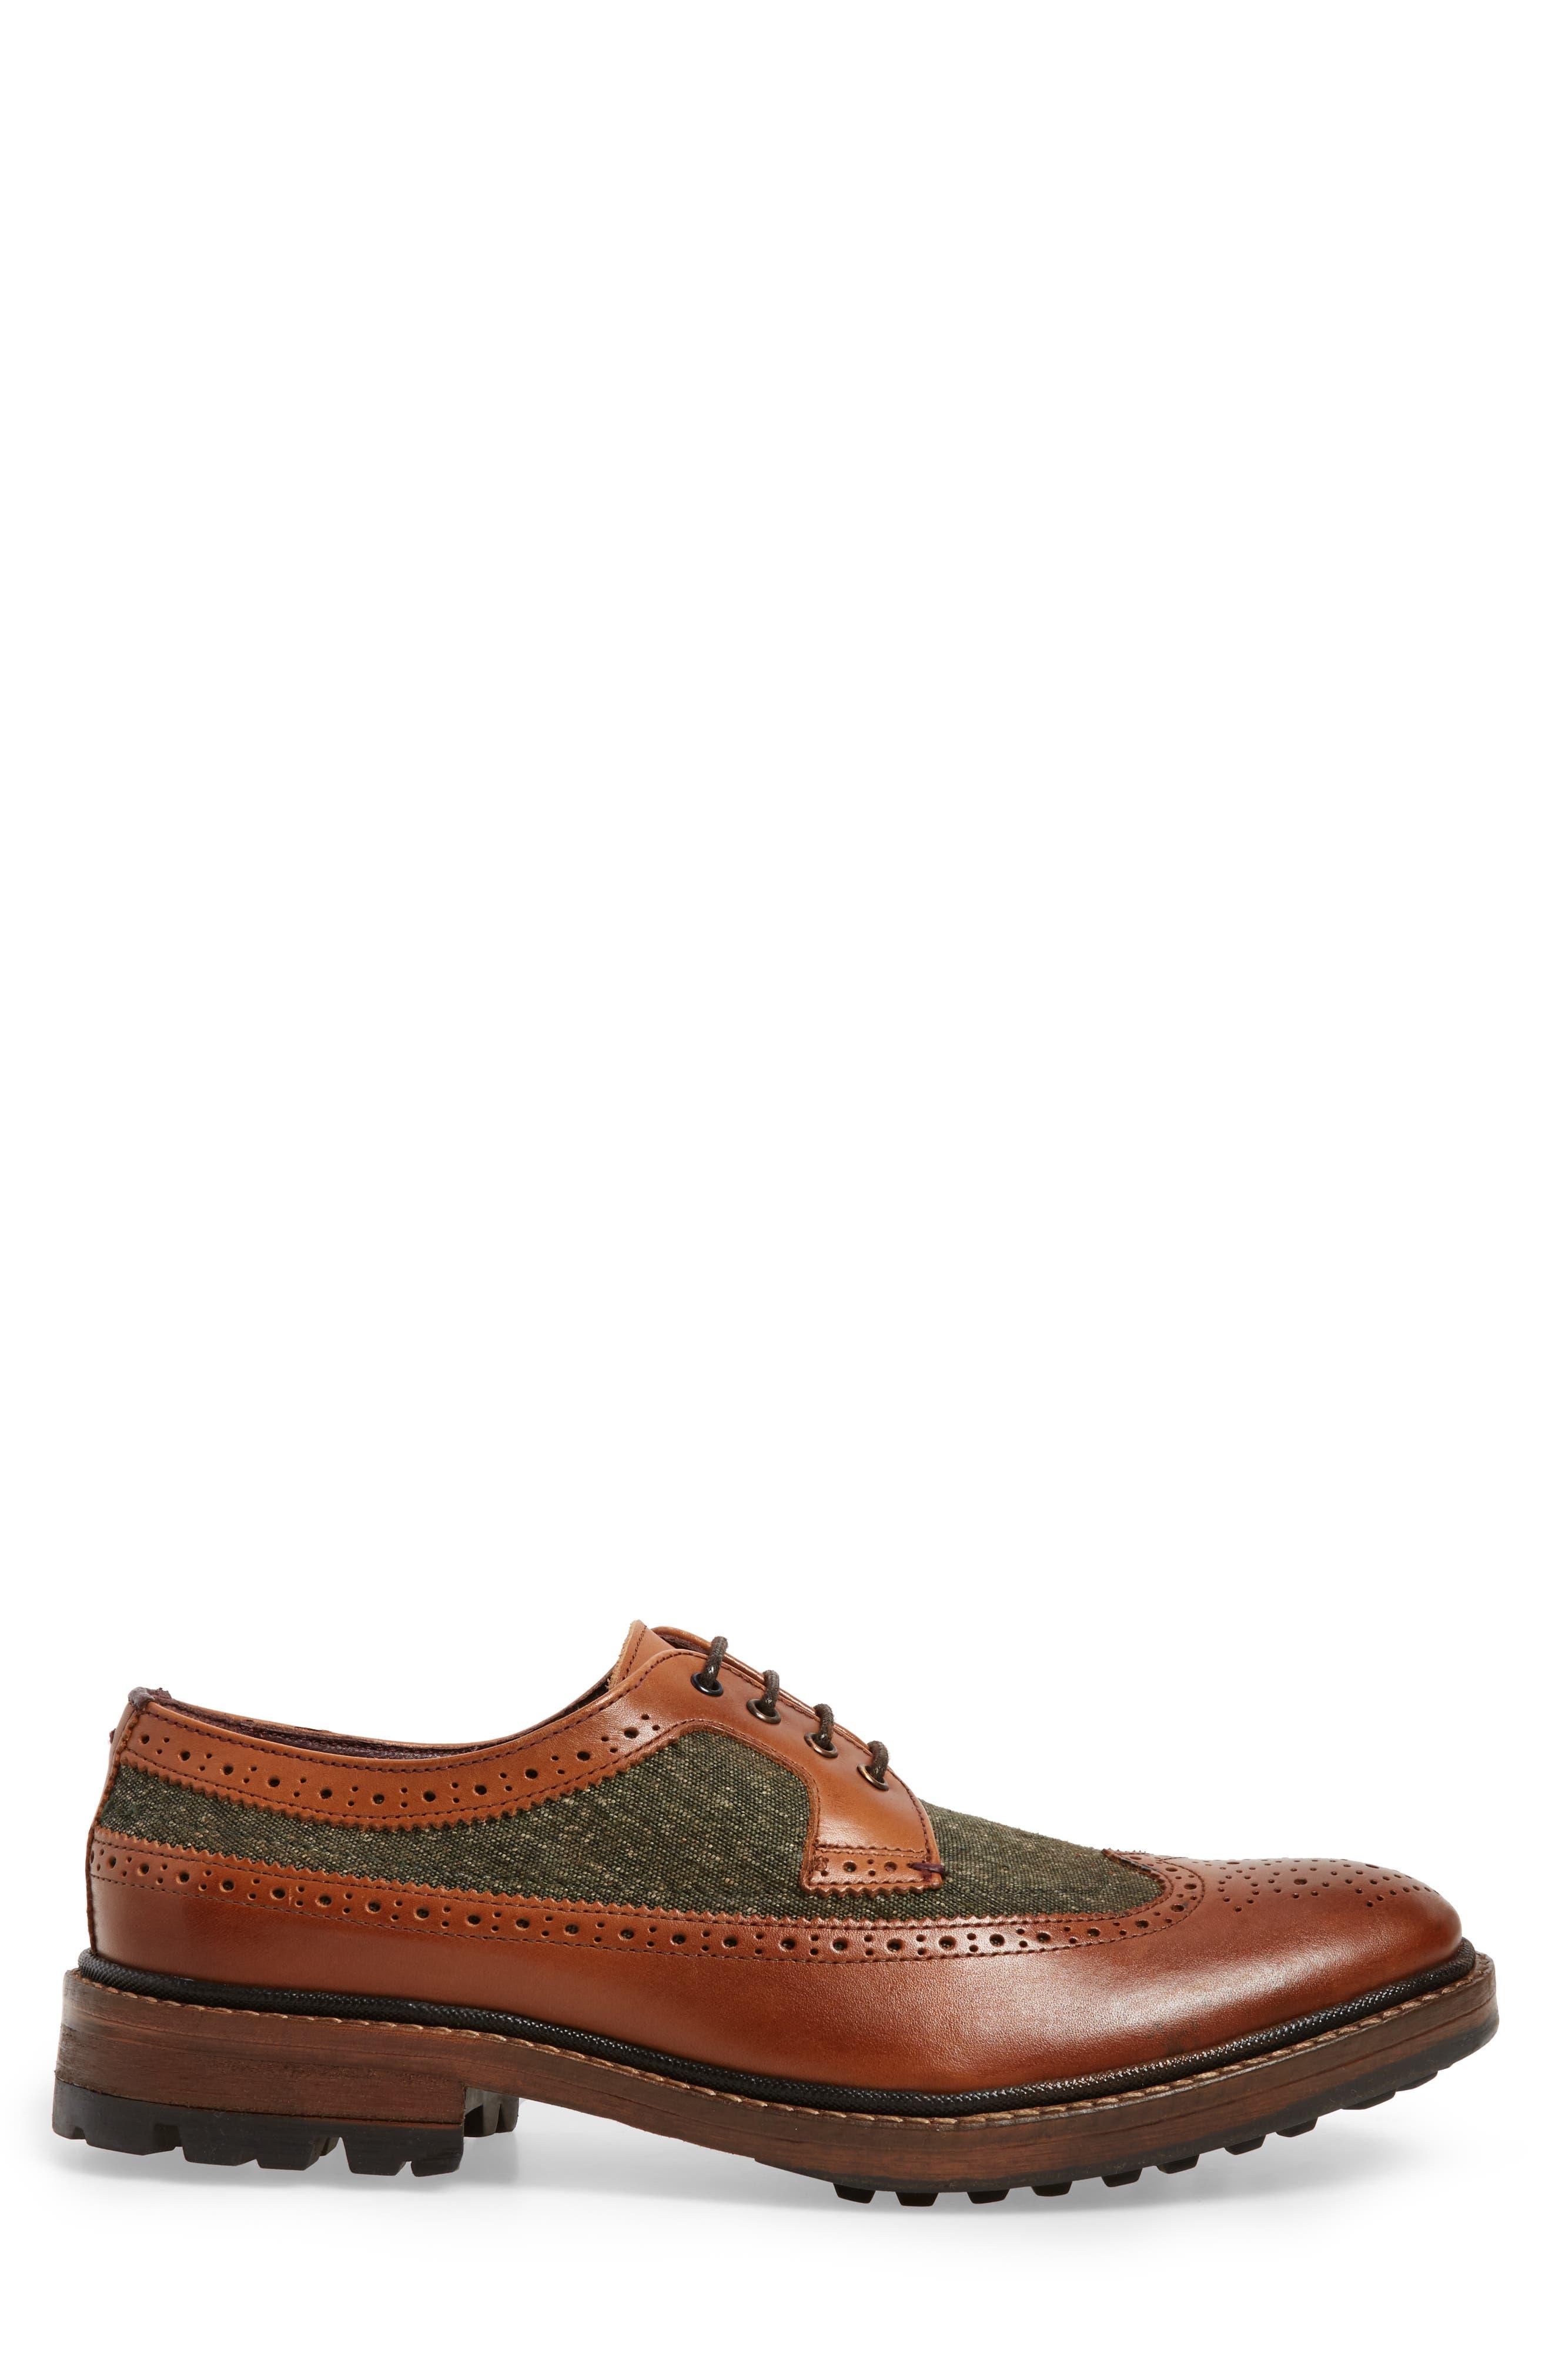 Casbo Spectator Shoe,                             Alternate thumbnail 3, color,                             Tan Multi Leather